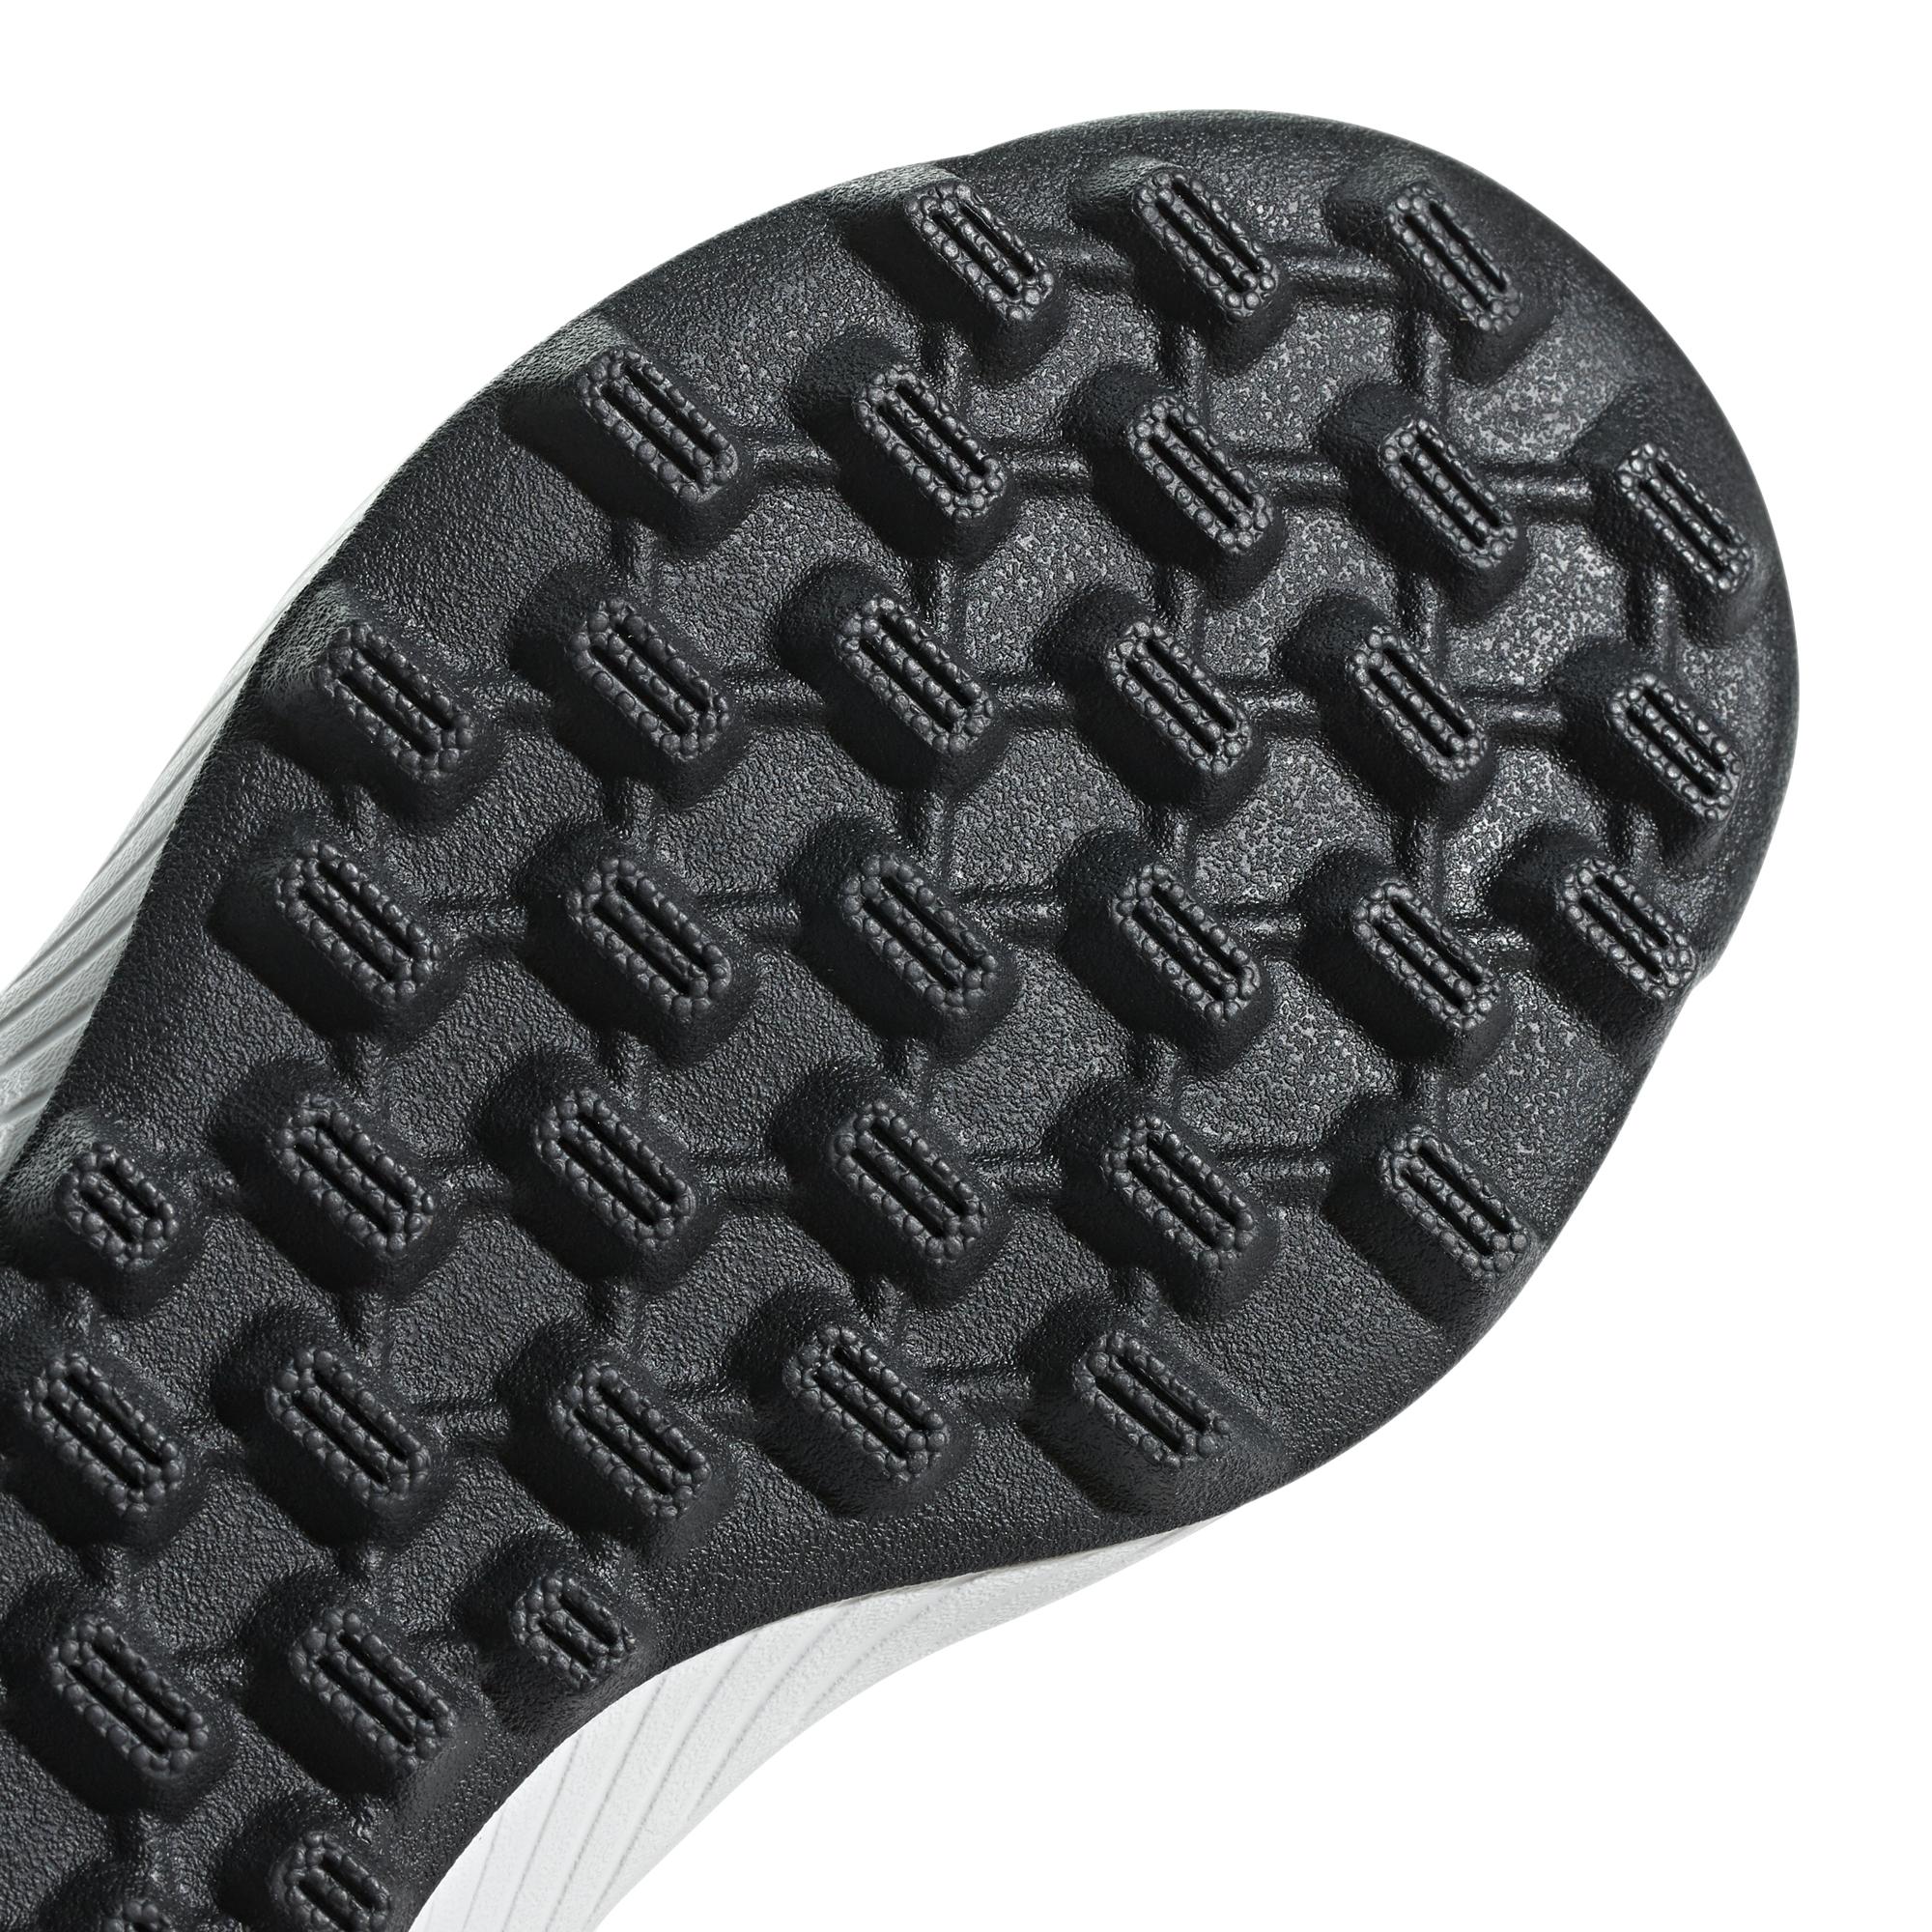 170d2003a9c36 adidas RapidaSnow BTW C AH2607 || timsport.pl - dodatkowe zniżki ...